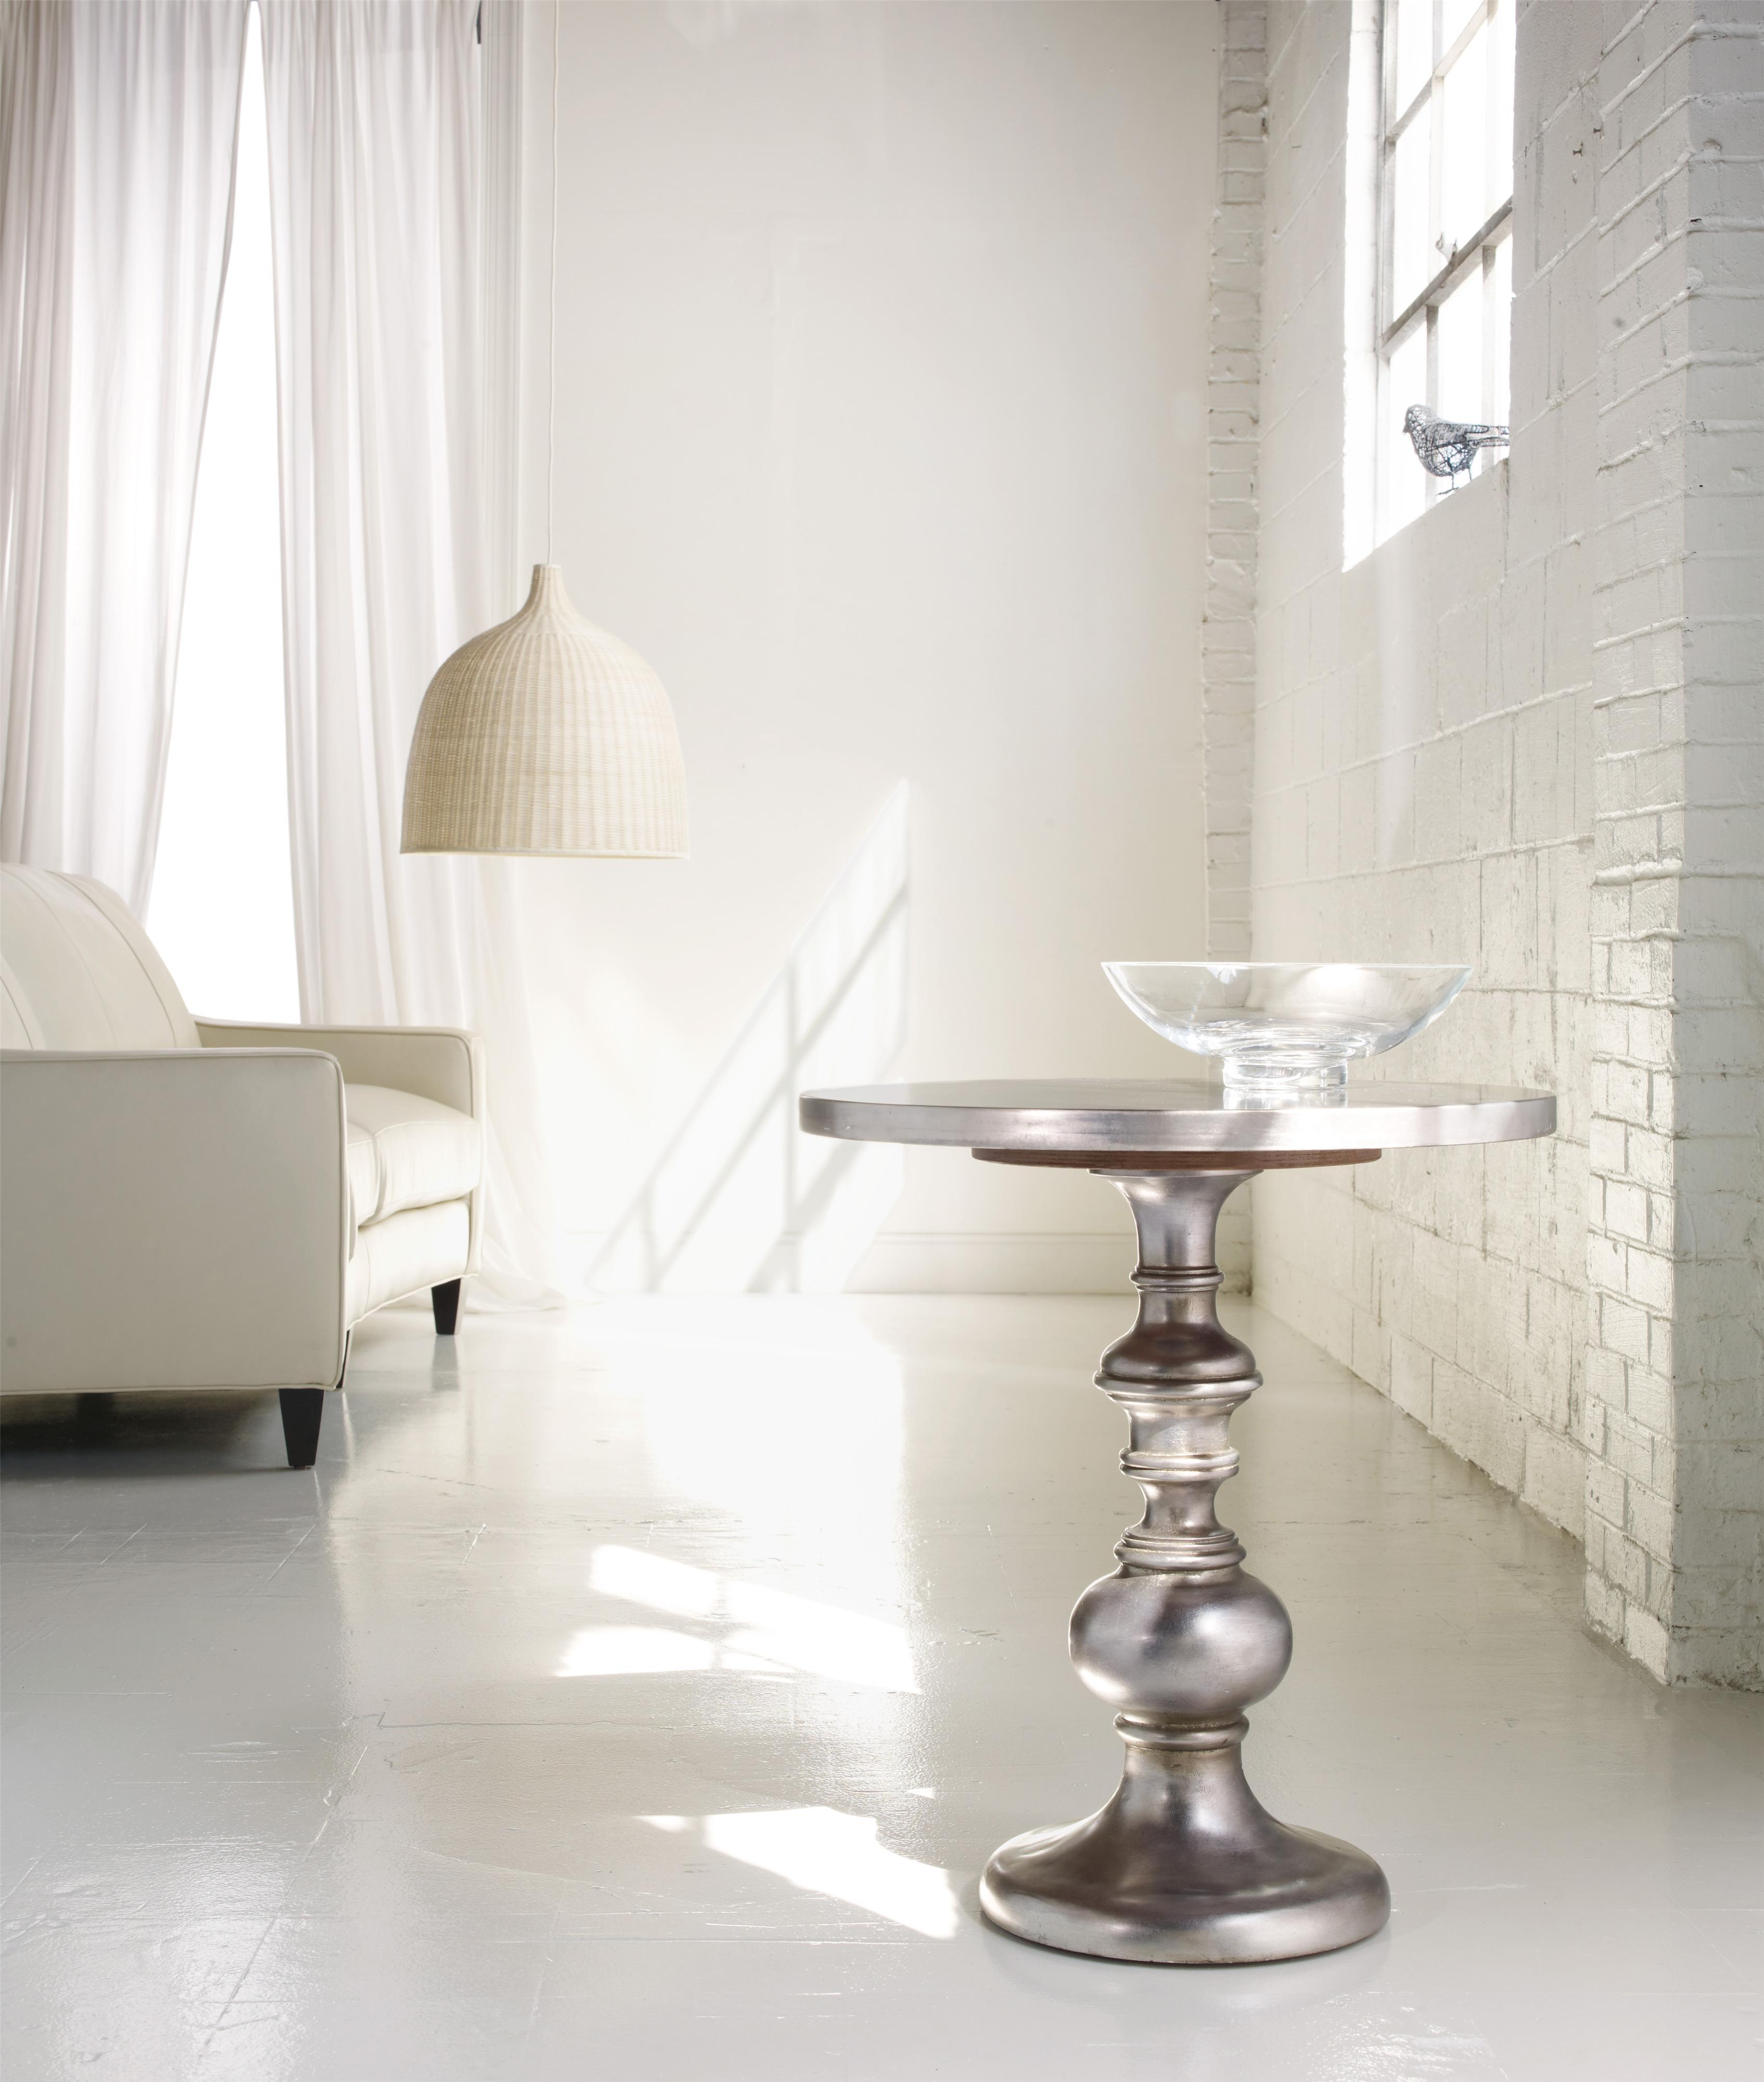 Hooker Furniture M Lange Kenmar Turned Pedestal Table With Iridescent Faux Zinc Finish Zak 39 S